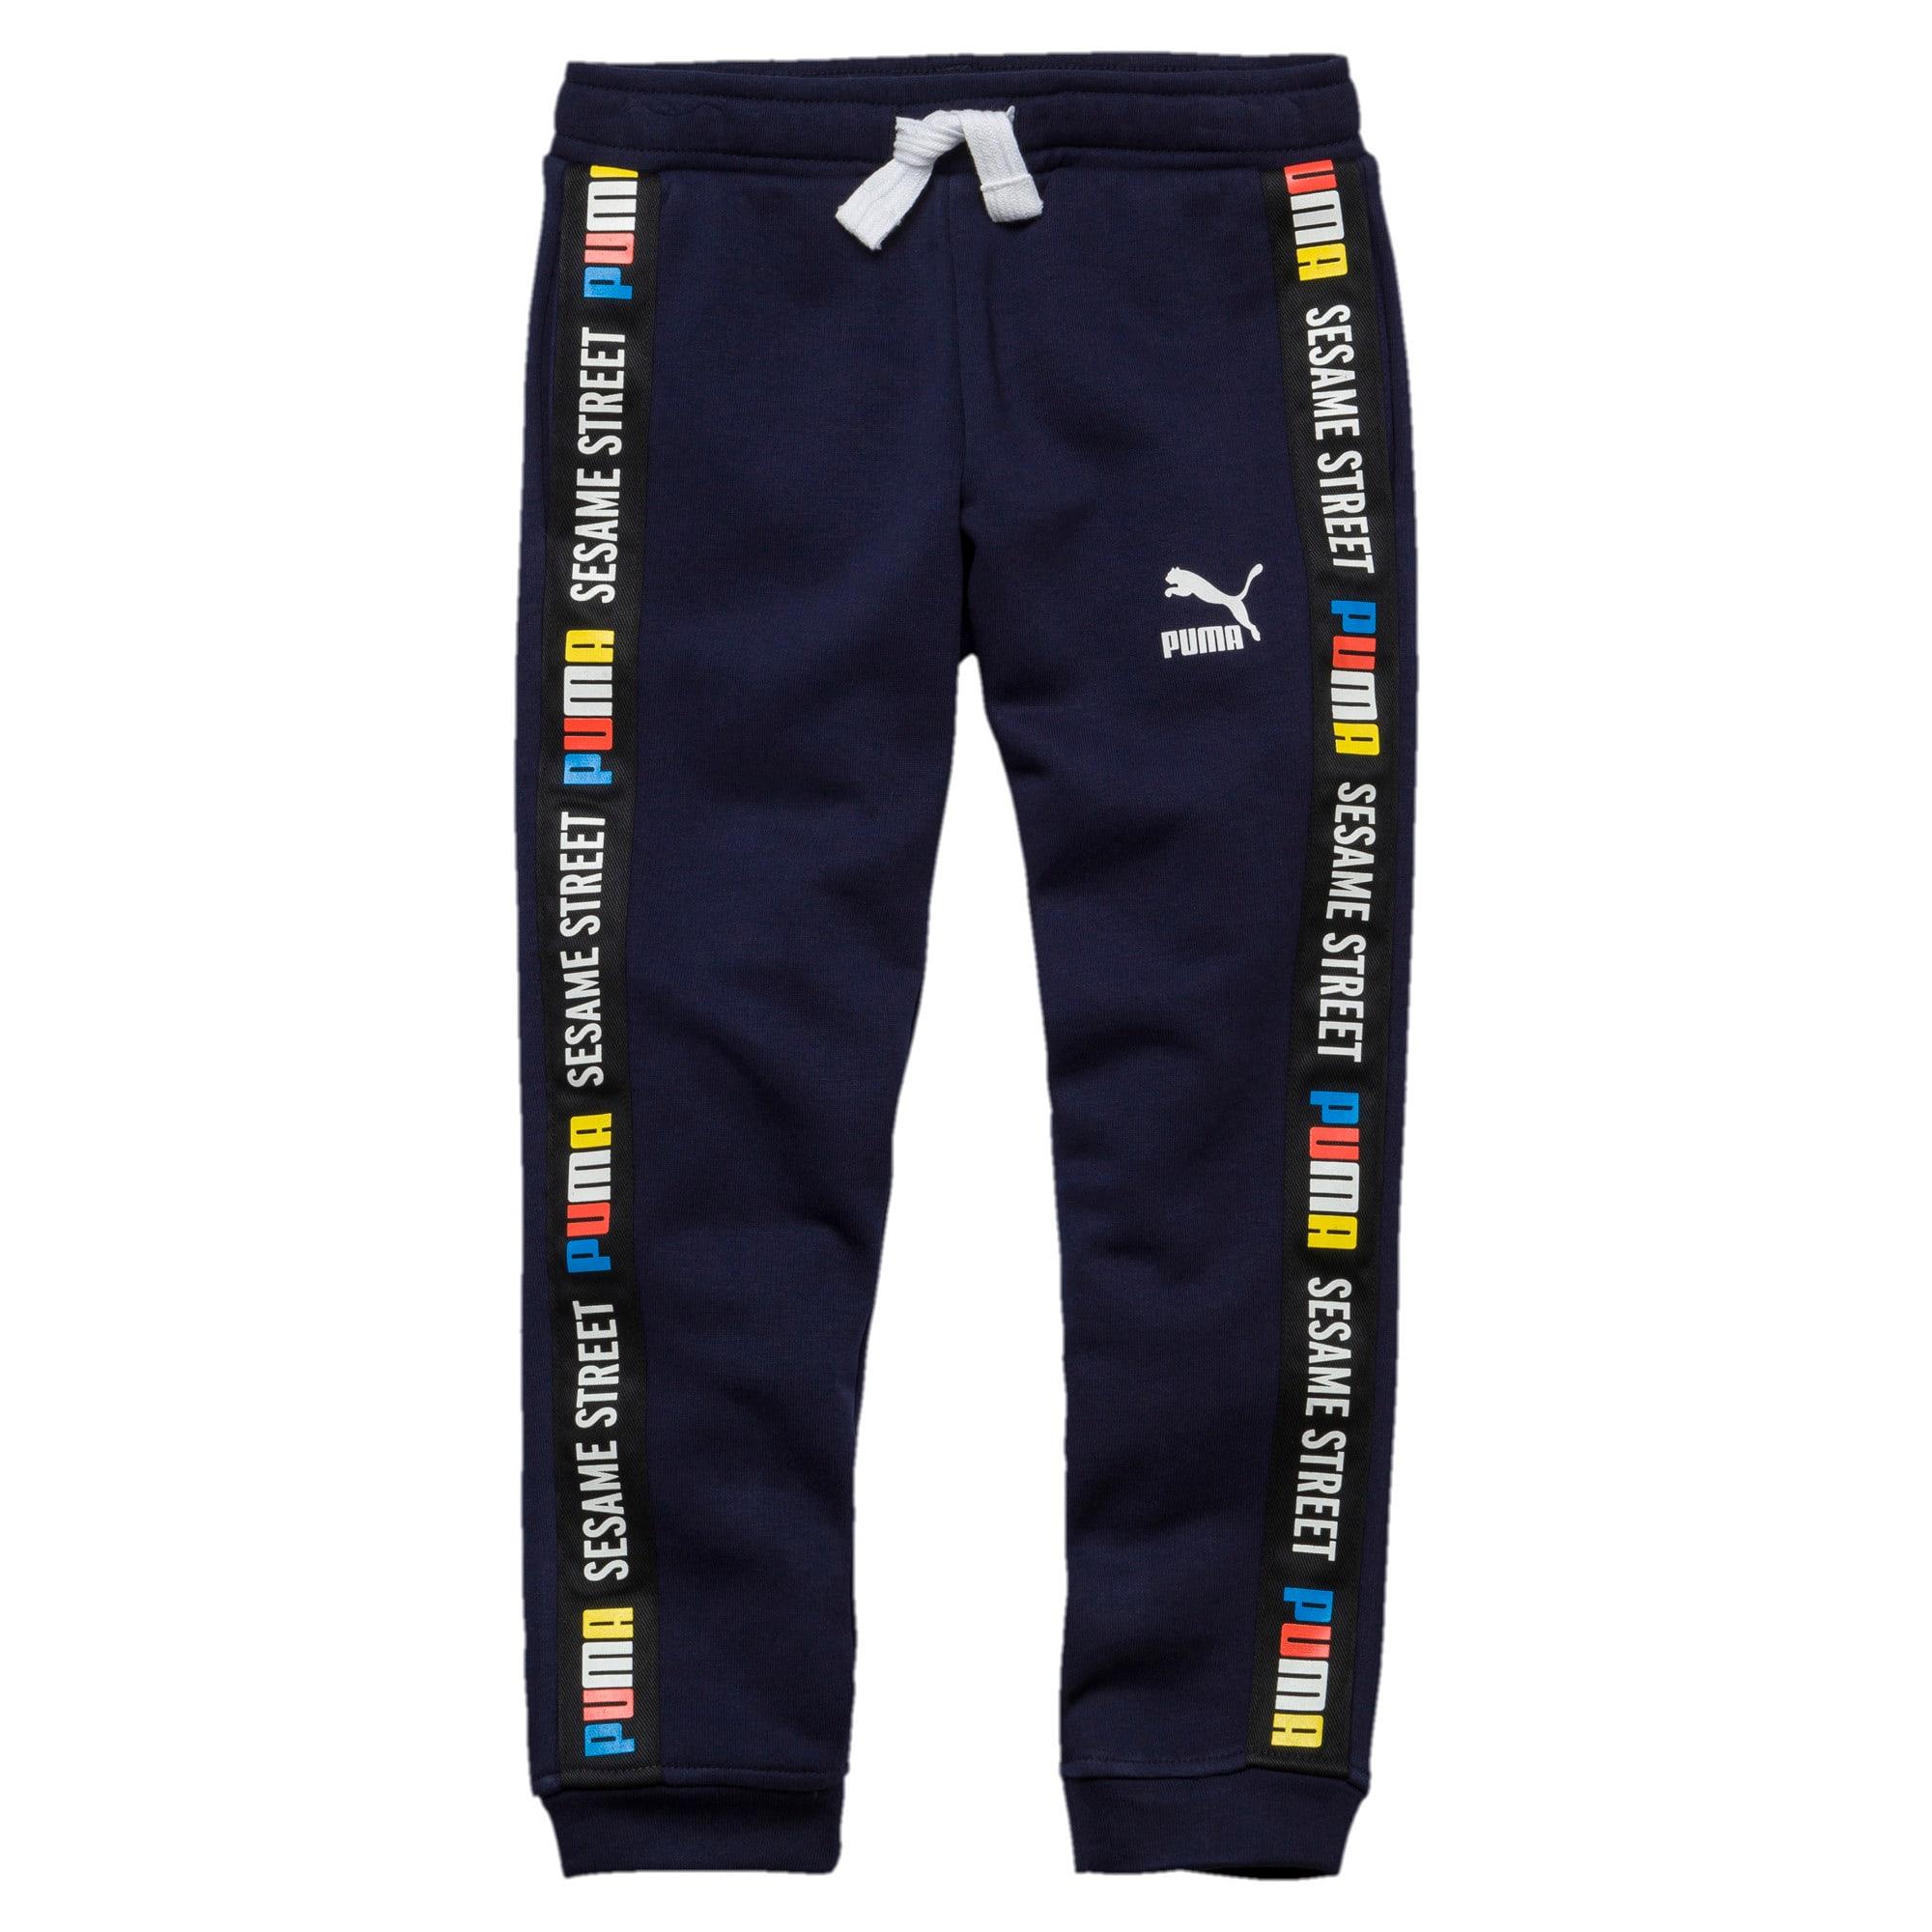 Thumbnail 1 of Sesame Street Knitted Boys' Pants, Peacoat, medium